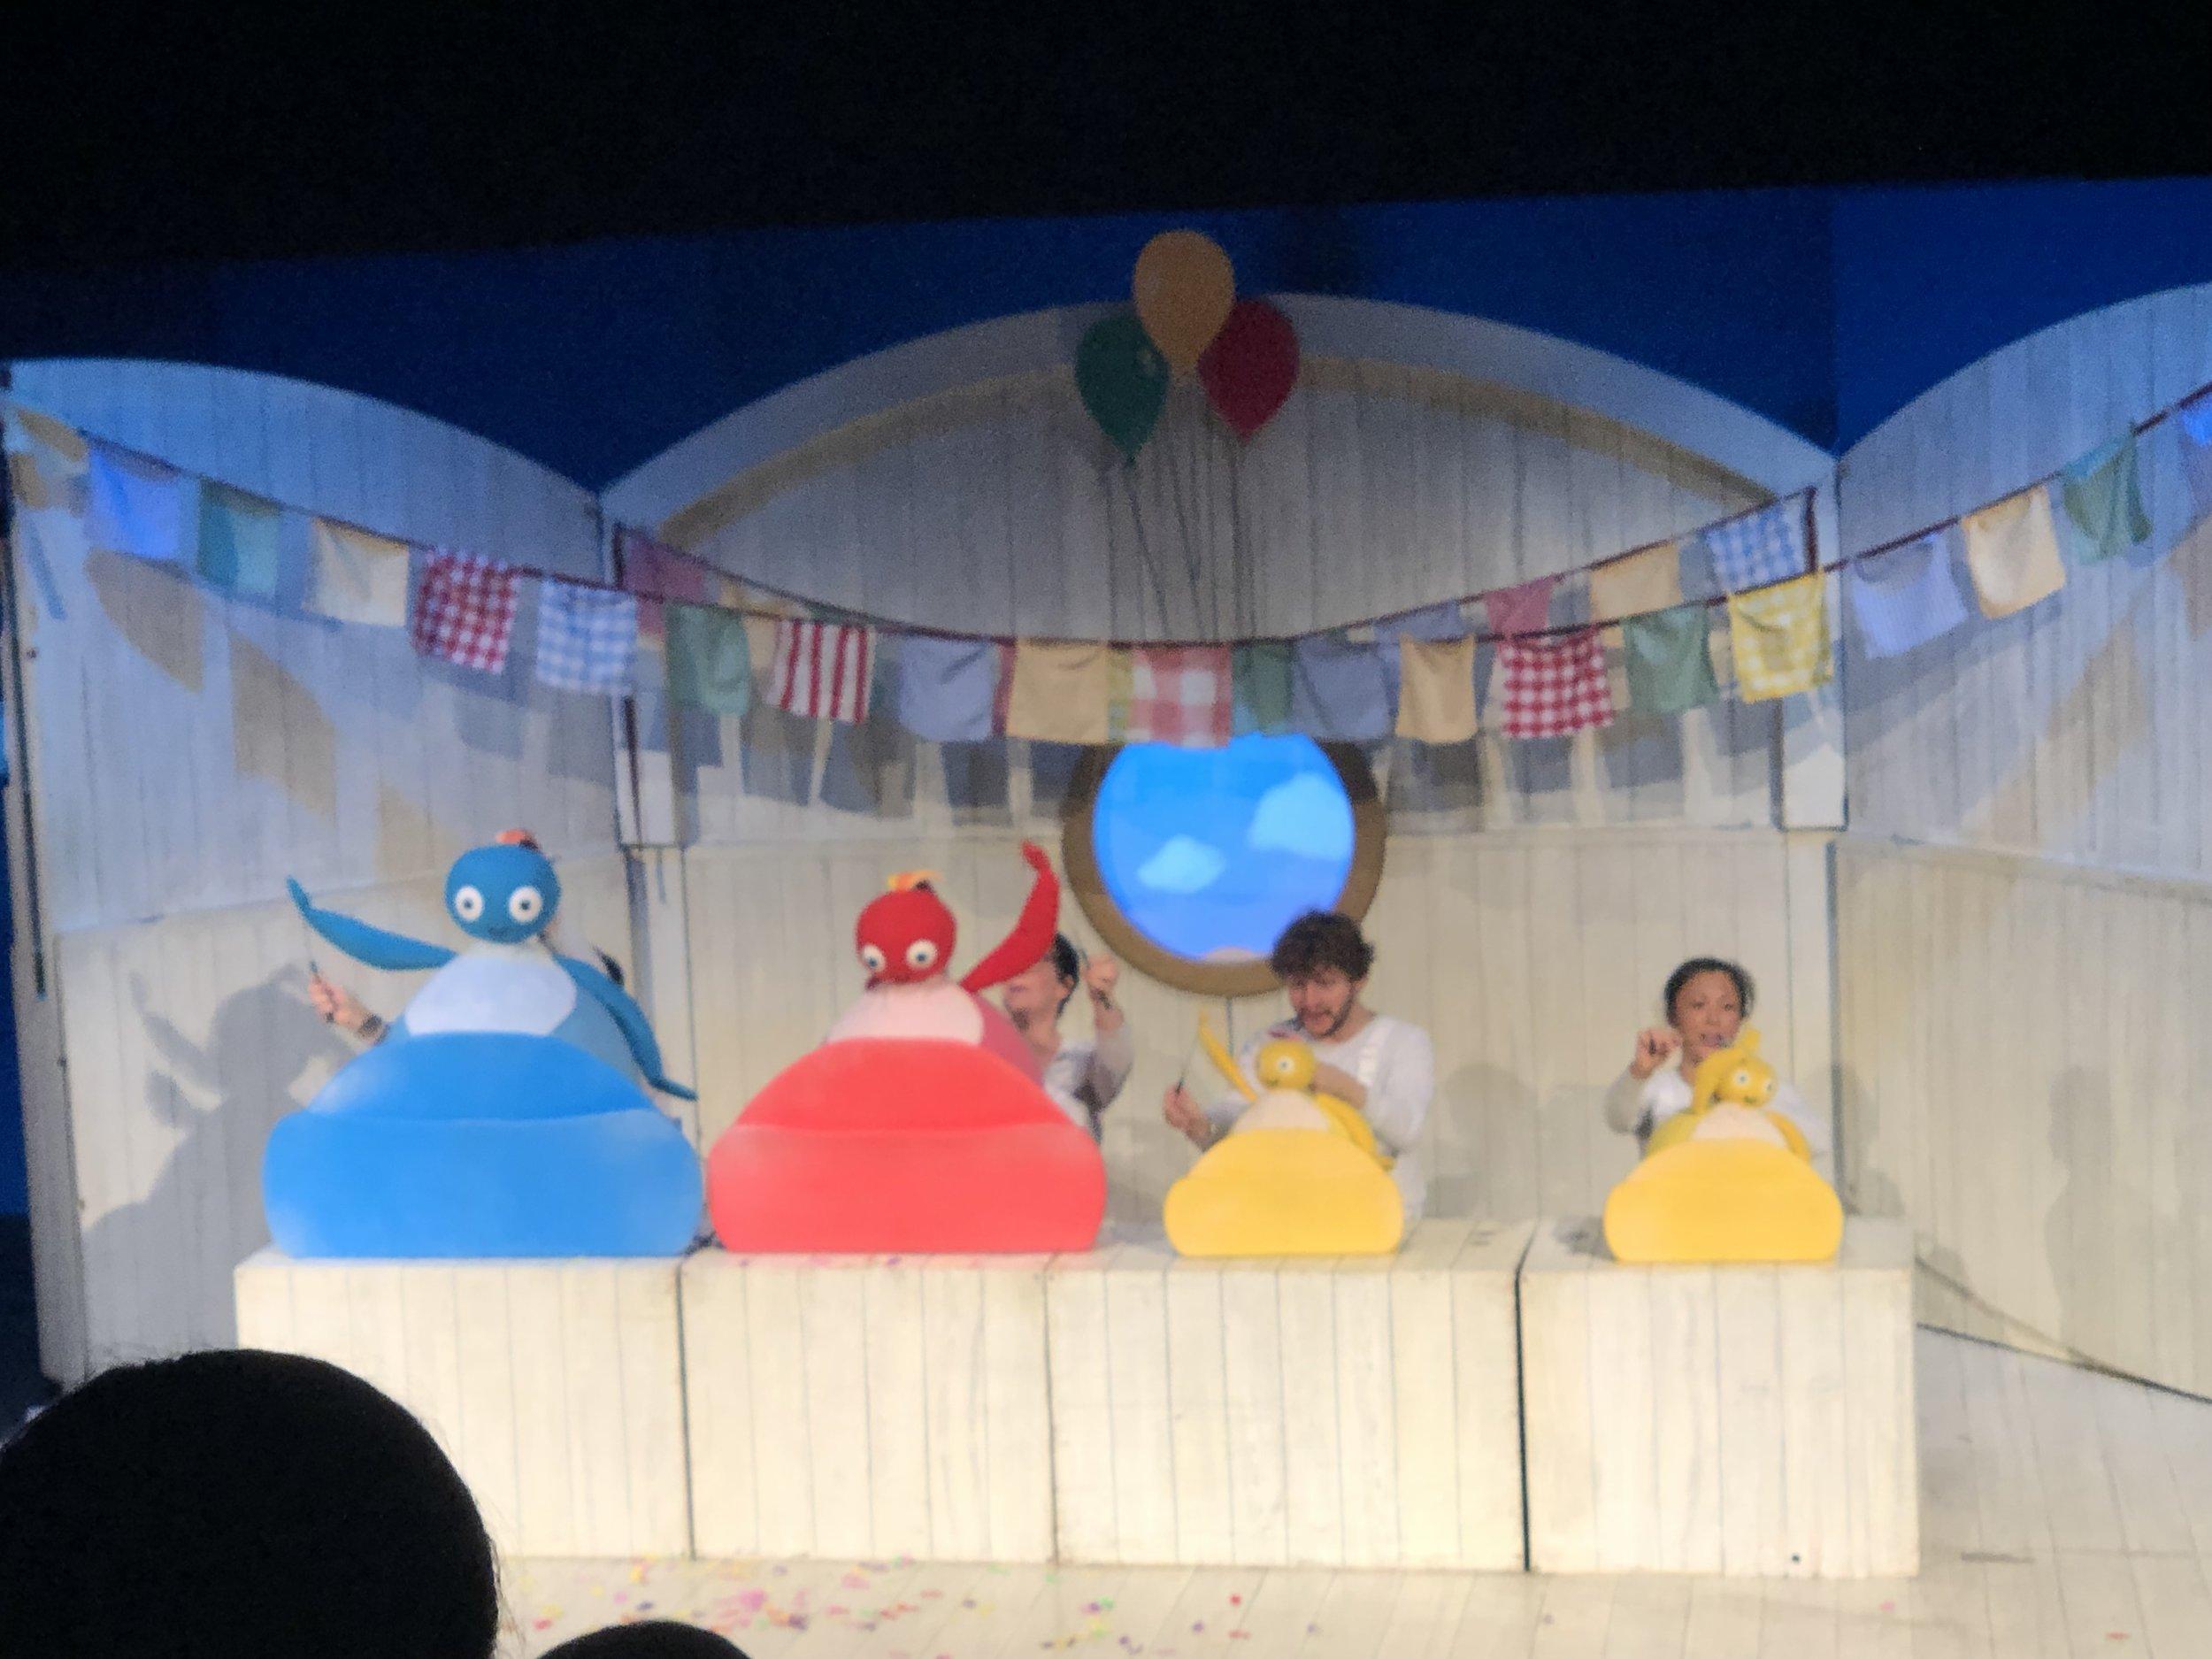 twirlywoos-live-theatre-pre-schooler-under-fives-day-out-kent-tunbridge-wells-support-local-magazine.jpg